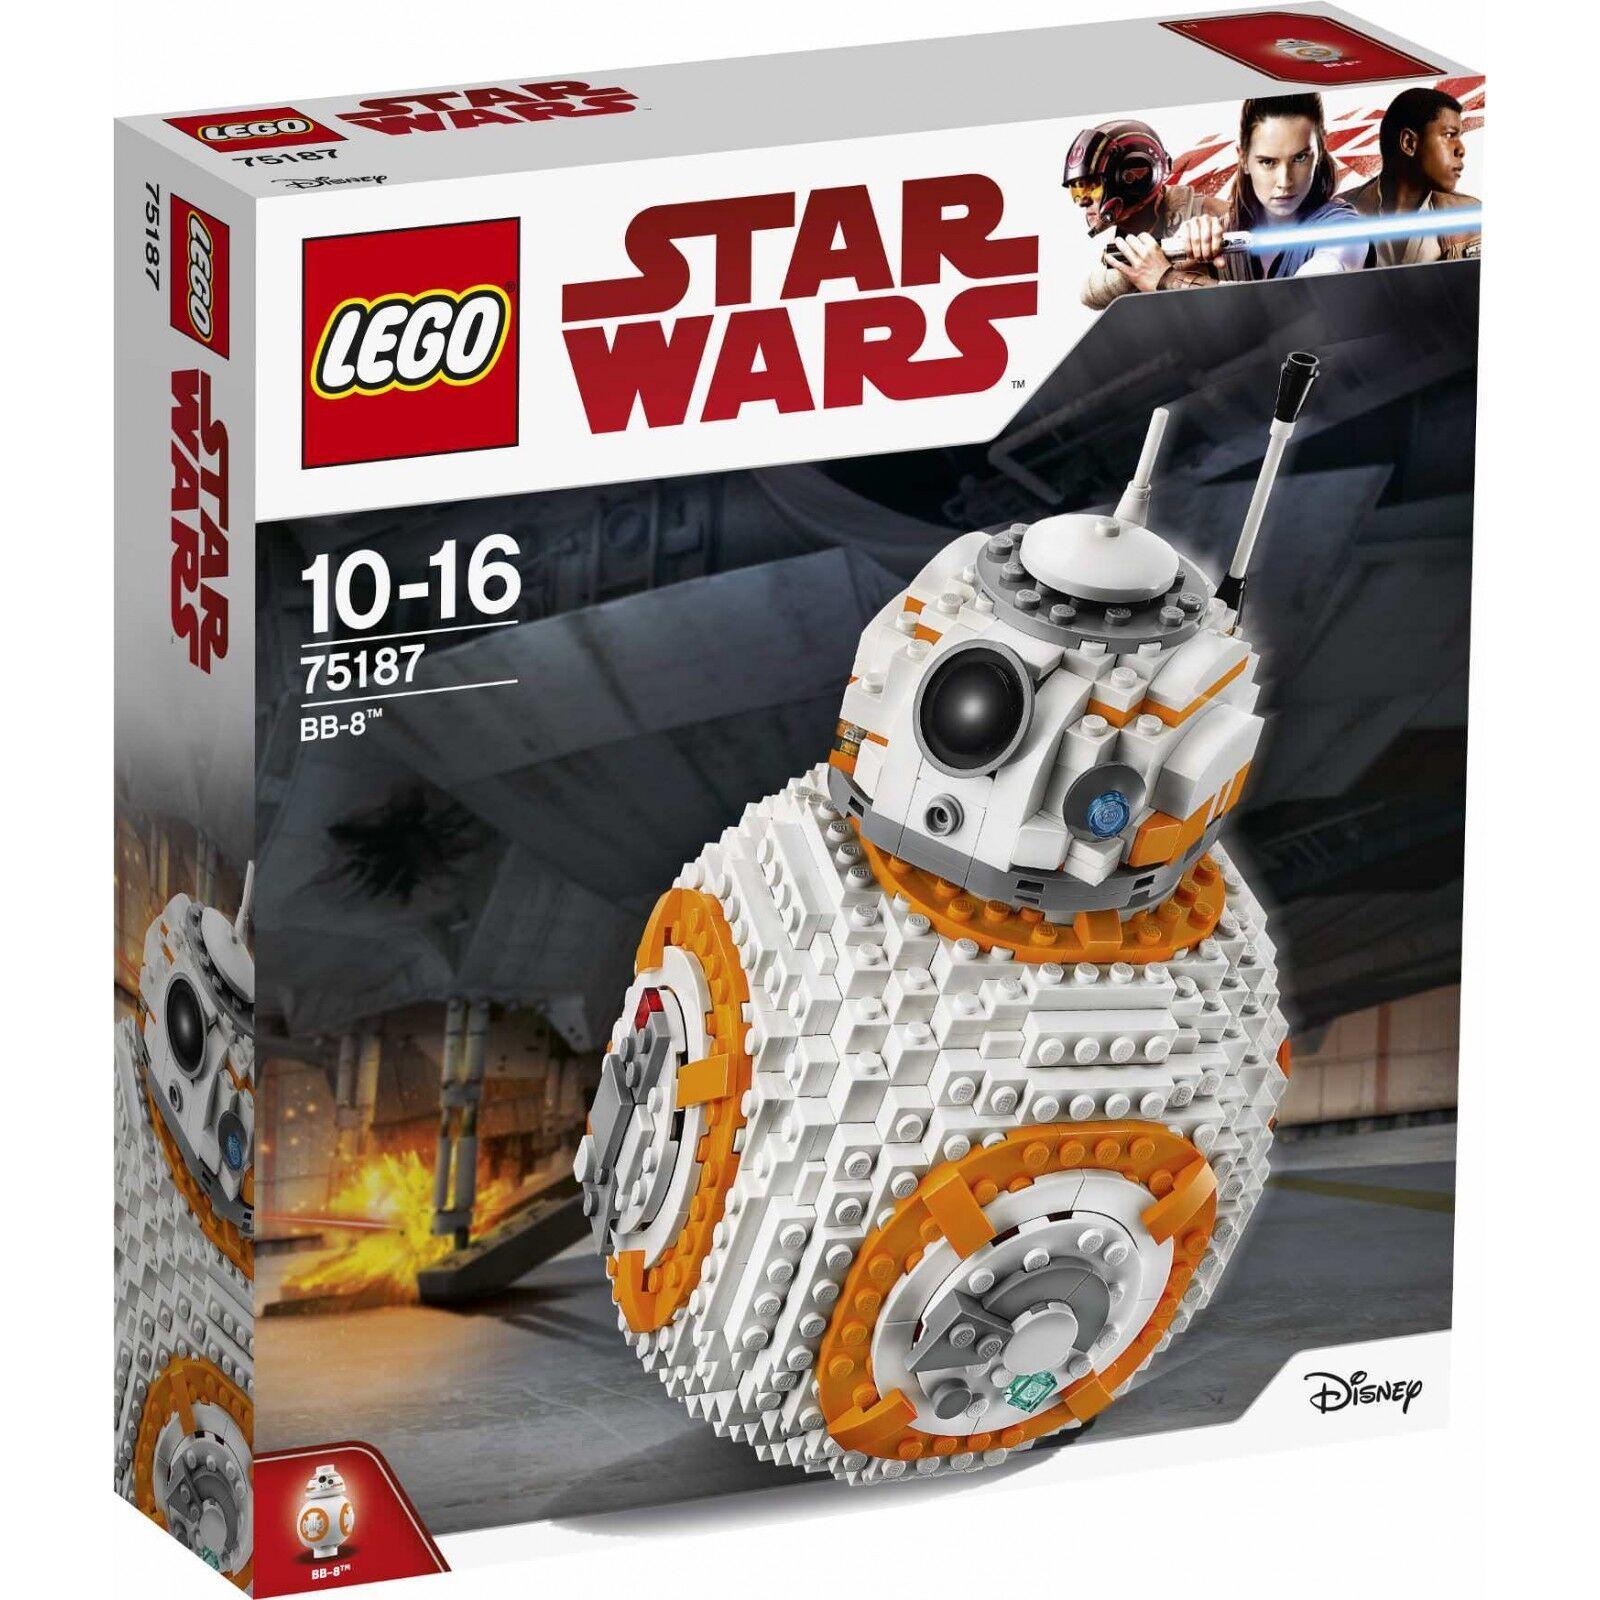 LEGO Star Wars 75187 BB-8 - L'ultimo Jedi-NUOVO